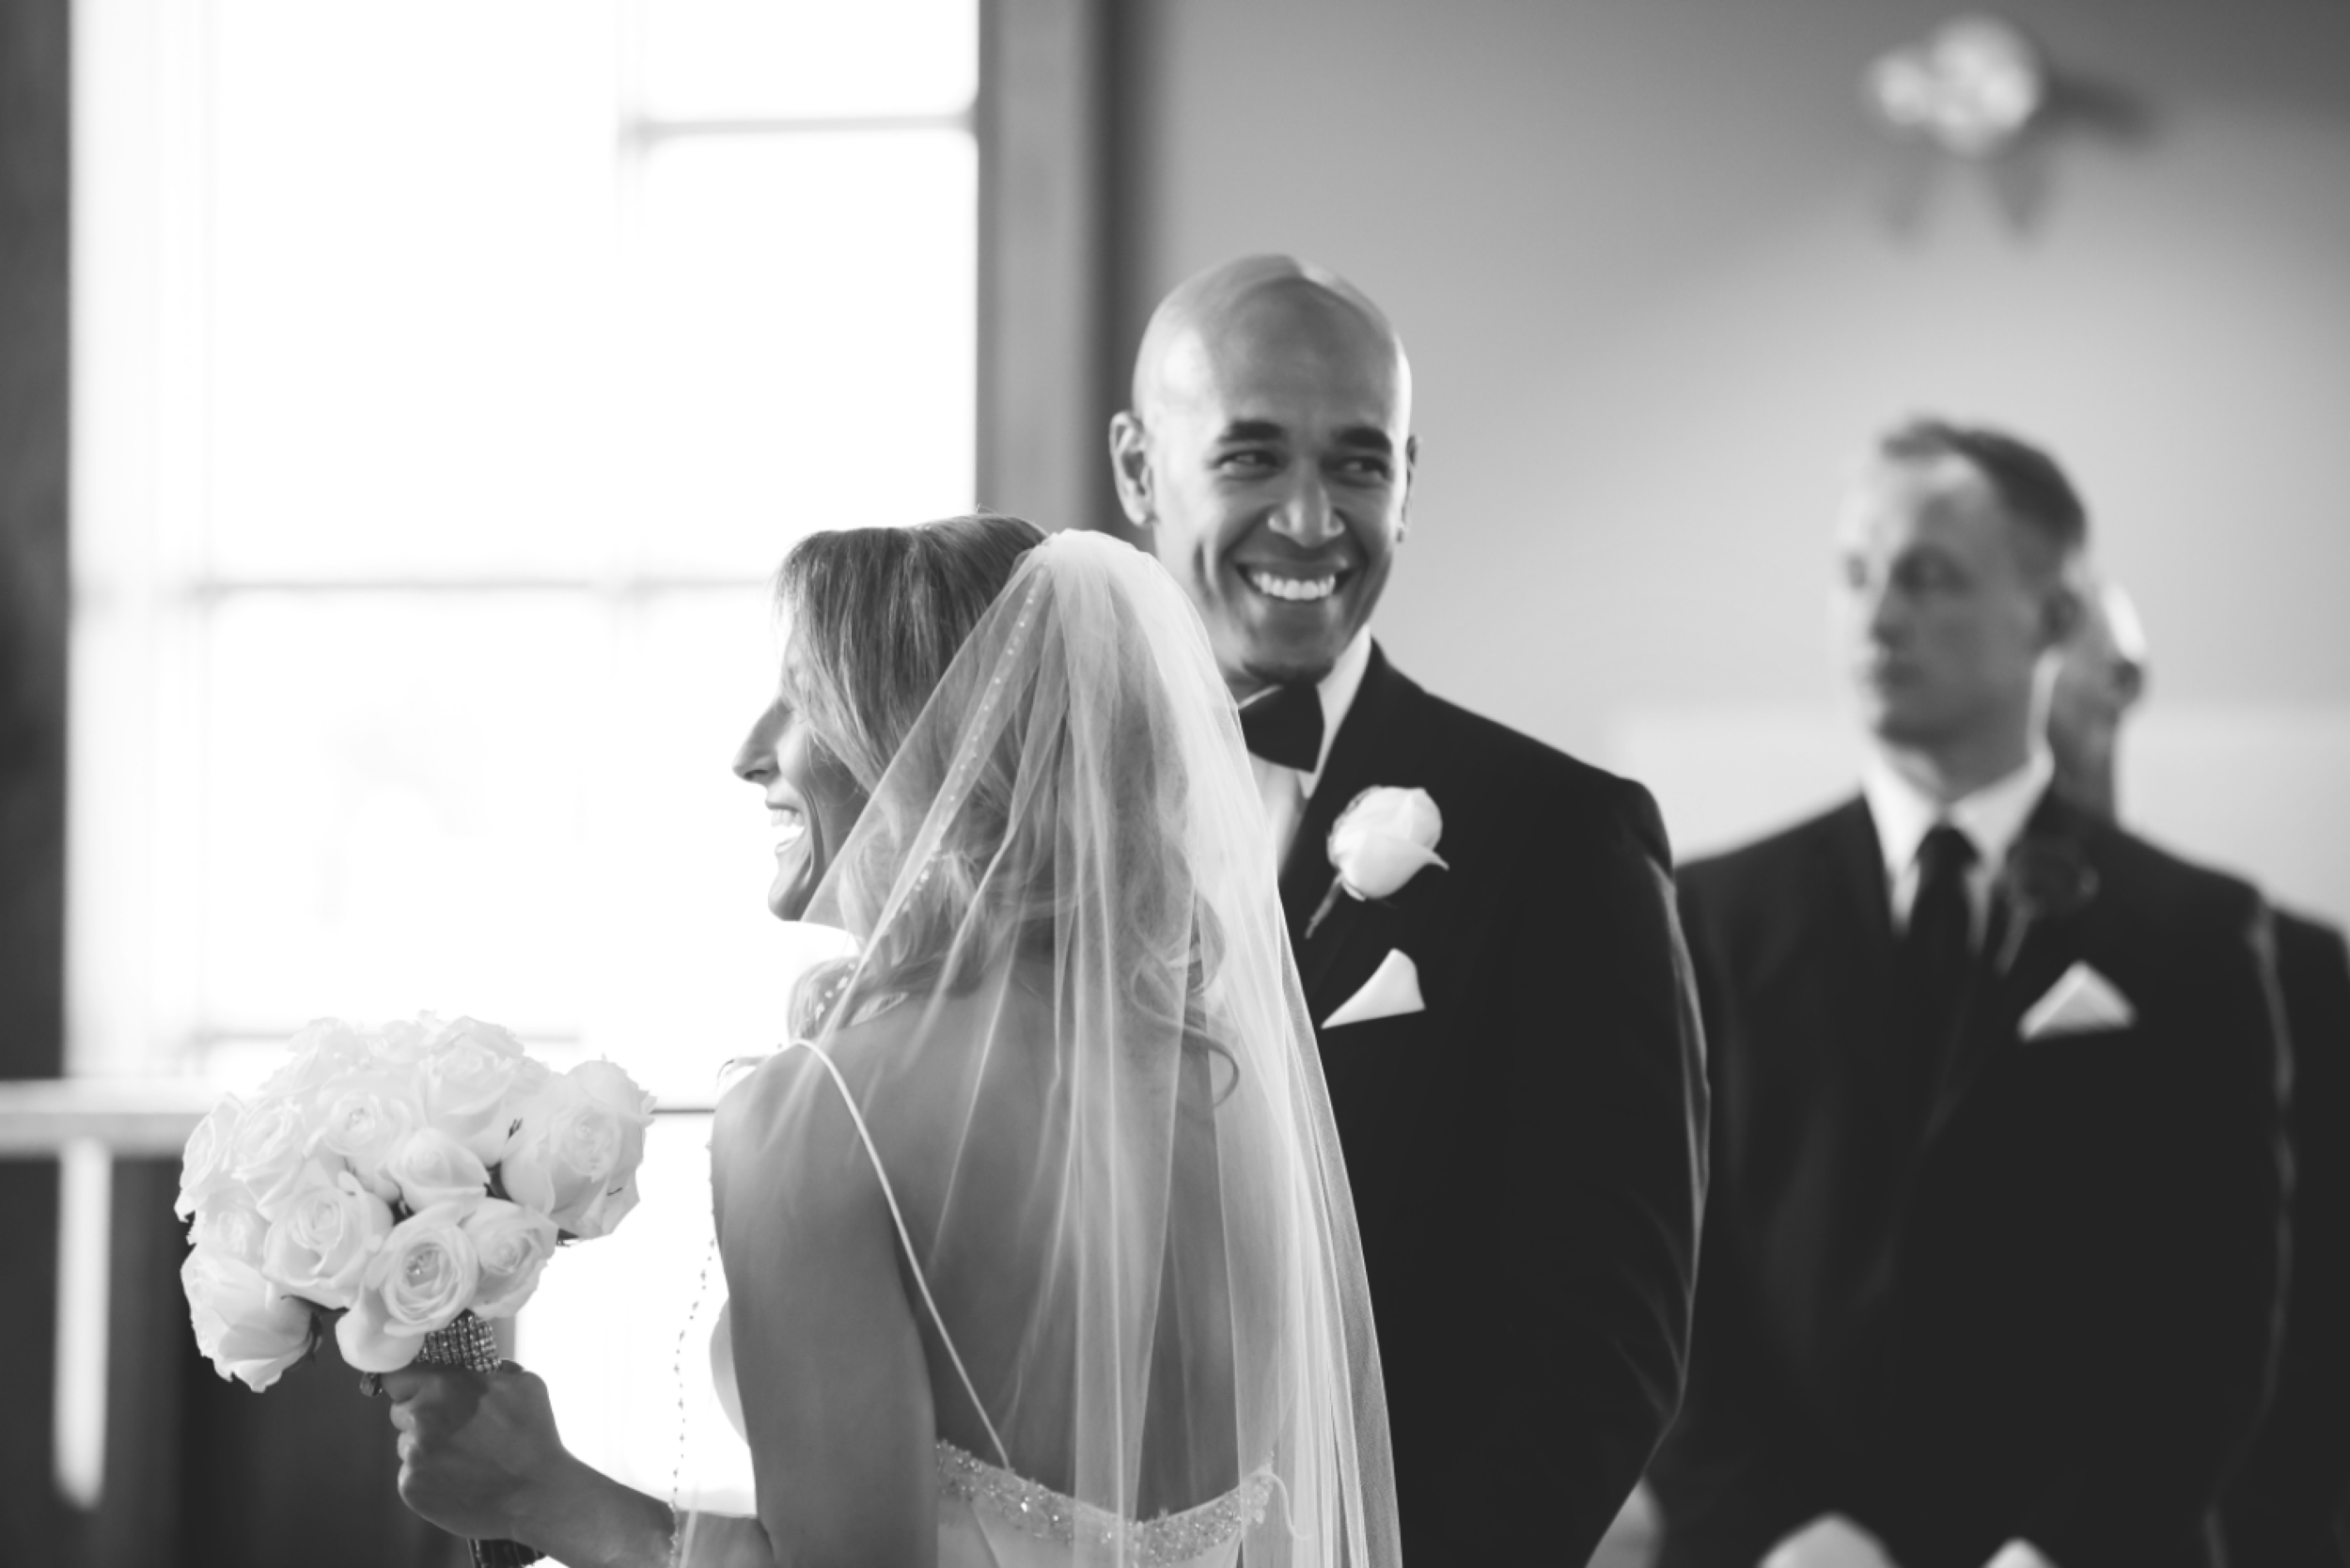 Wedding-Burlington-Convention-Center-Burlington-Oakville-Toronto-Hamilton-Niagara-Wedding-Photographer-Photography-Moments-by-Lauren-Photo-Image-20.png